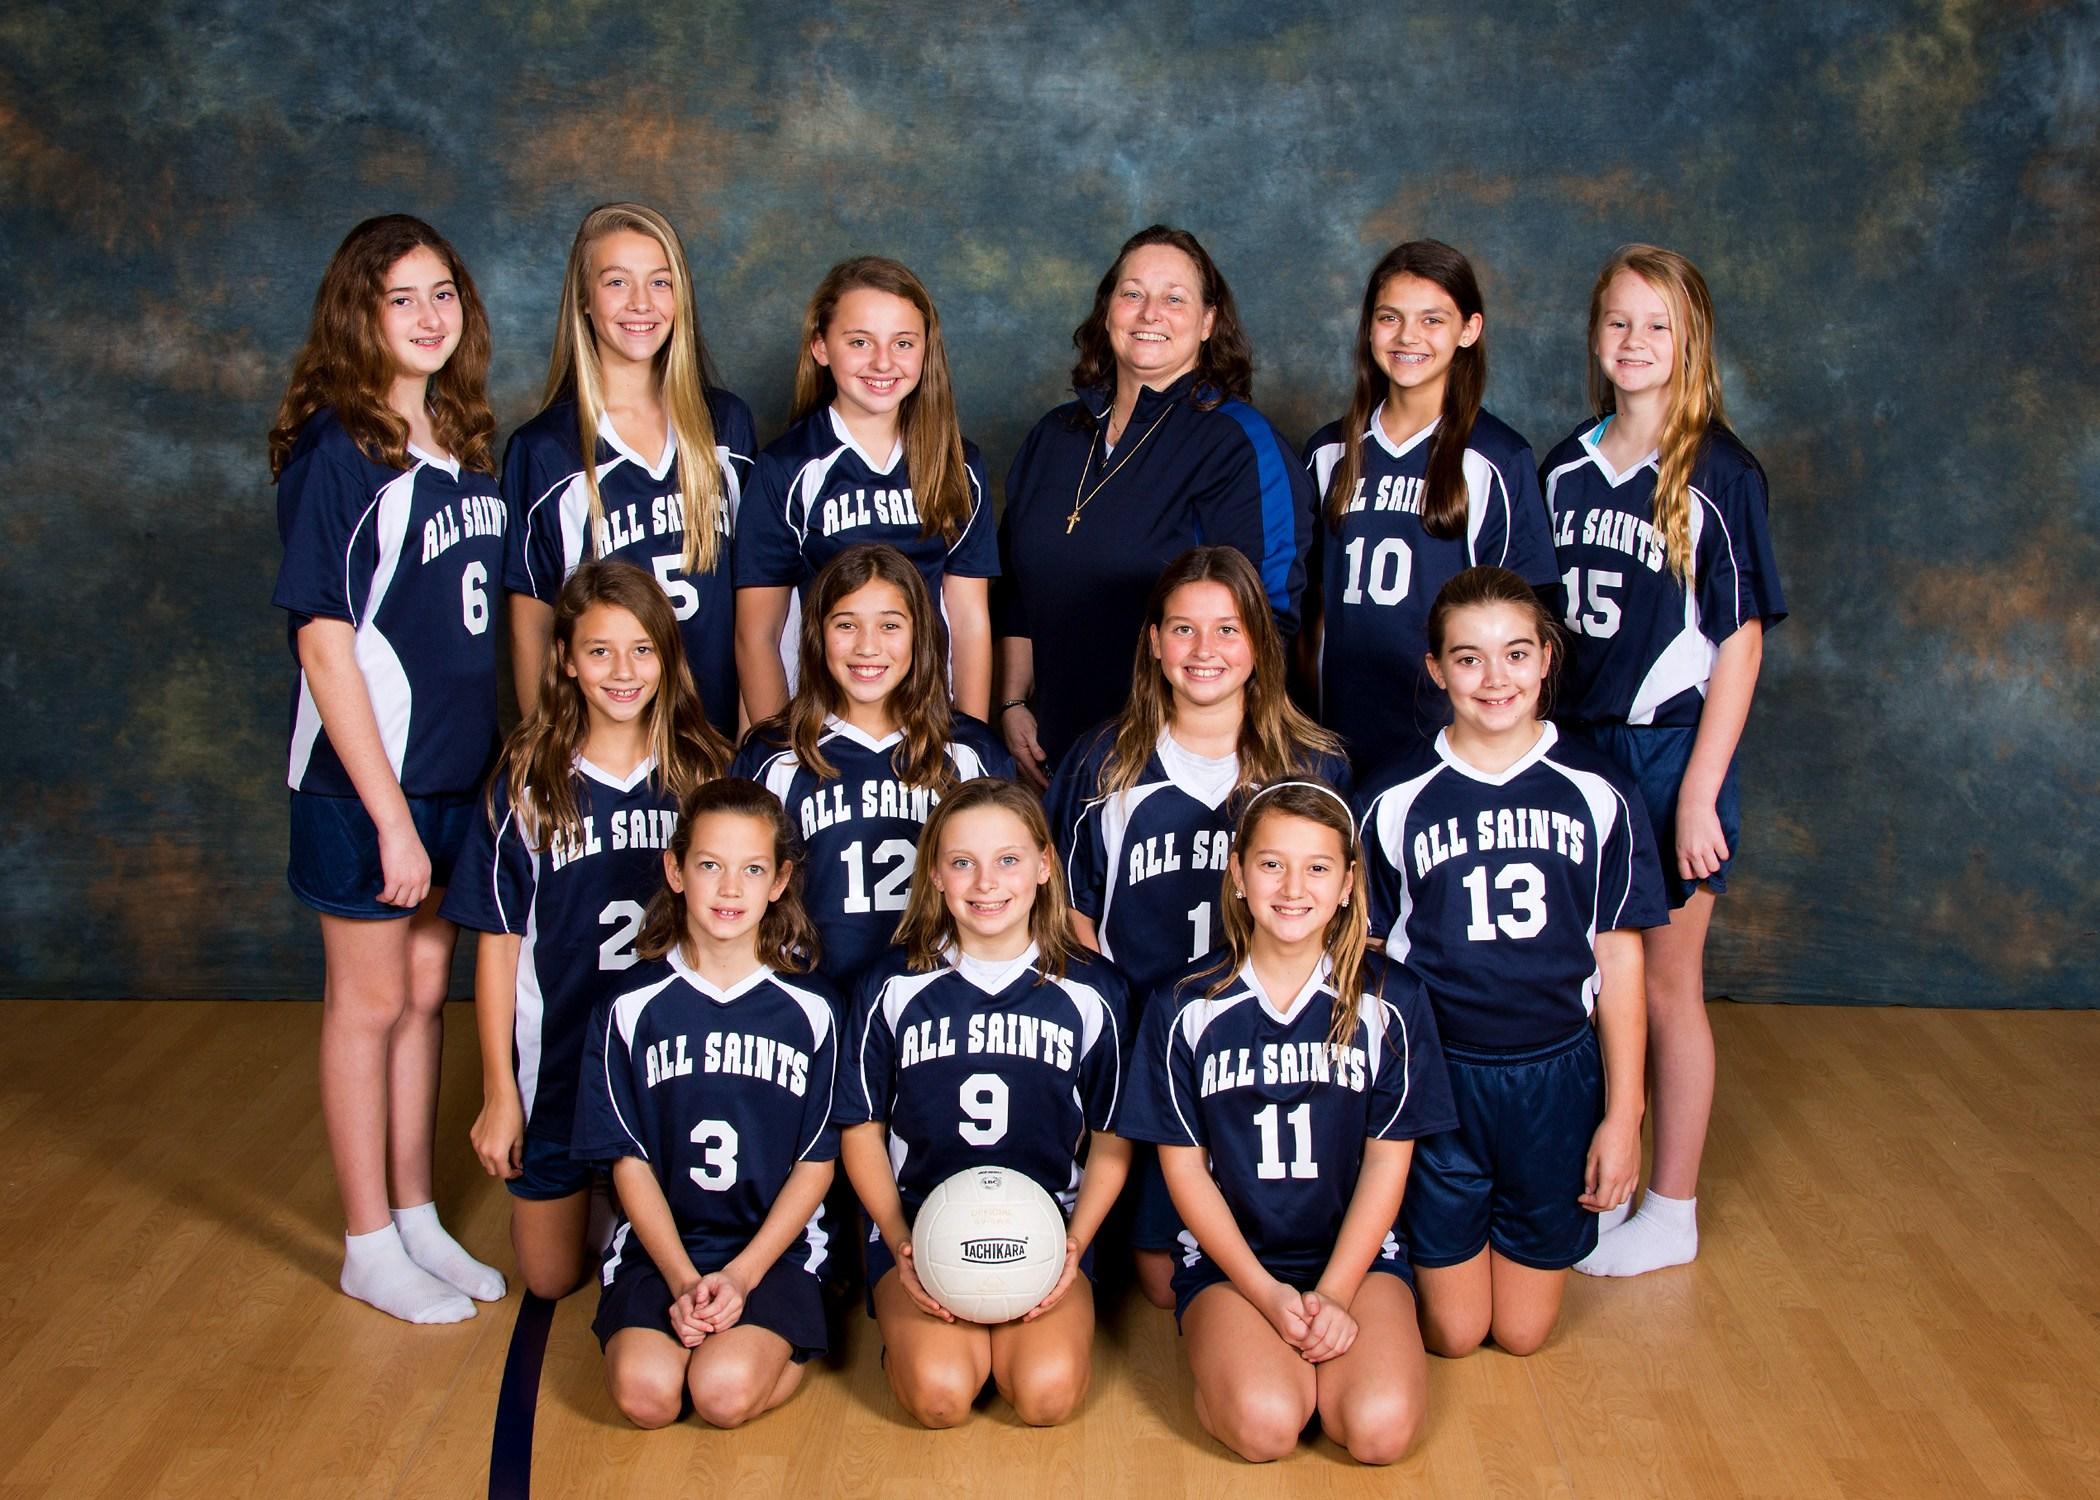 Girls Jv Volleyball Volleyball All Saints Catholic School